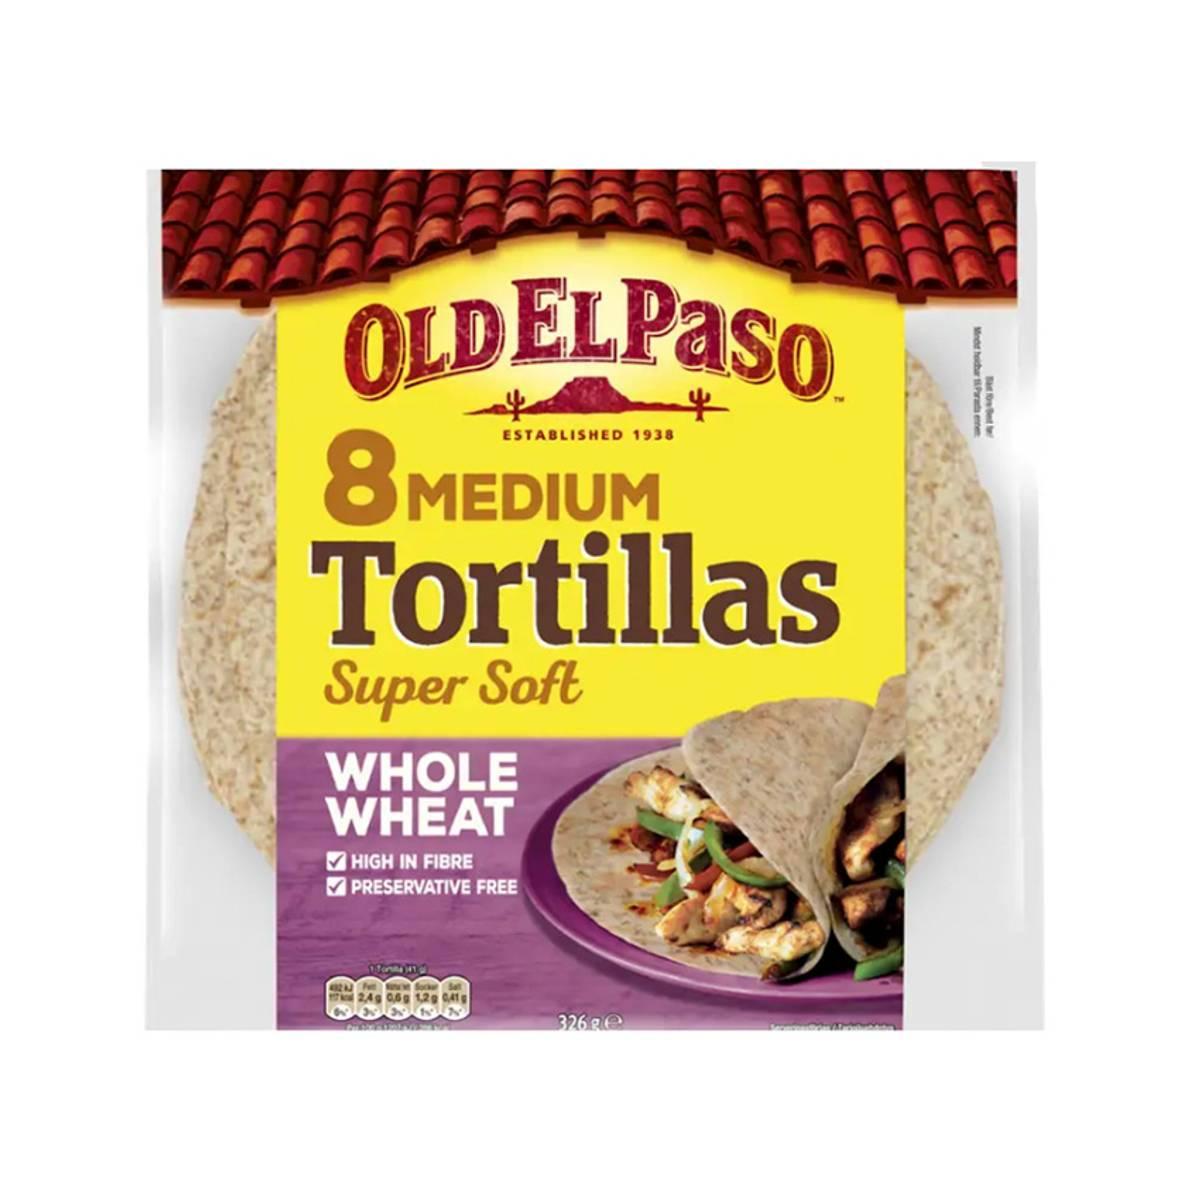 8 Medium Tortillas Whole Wheat